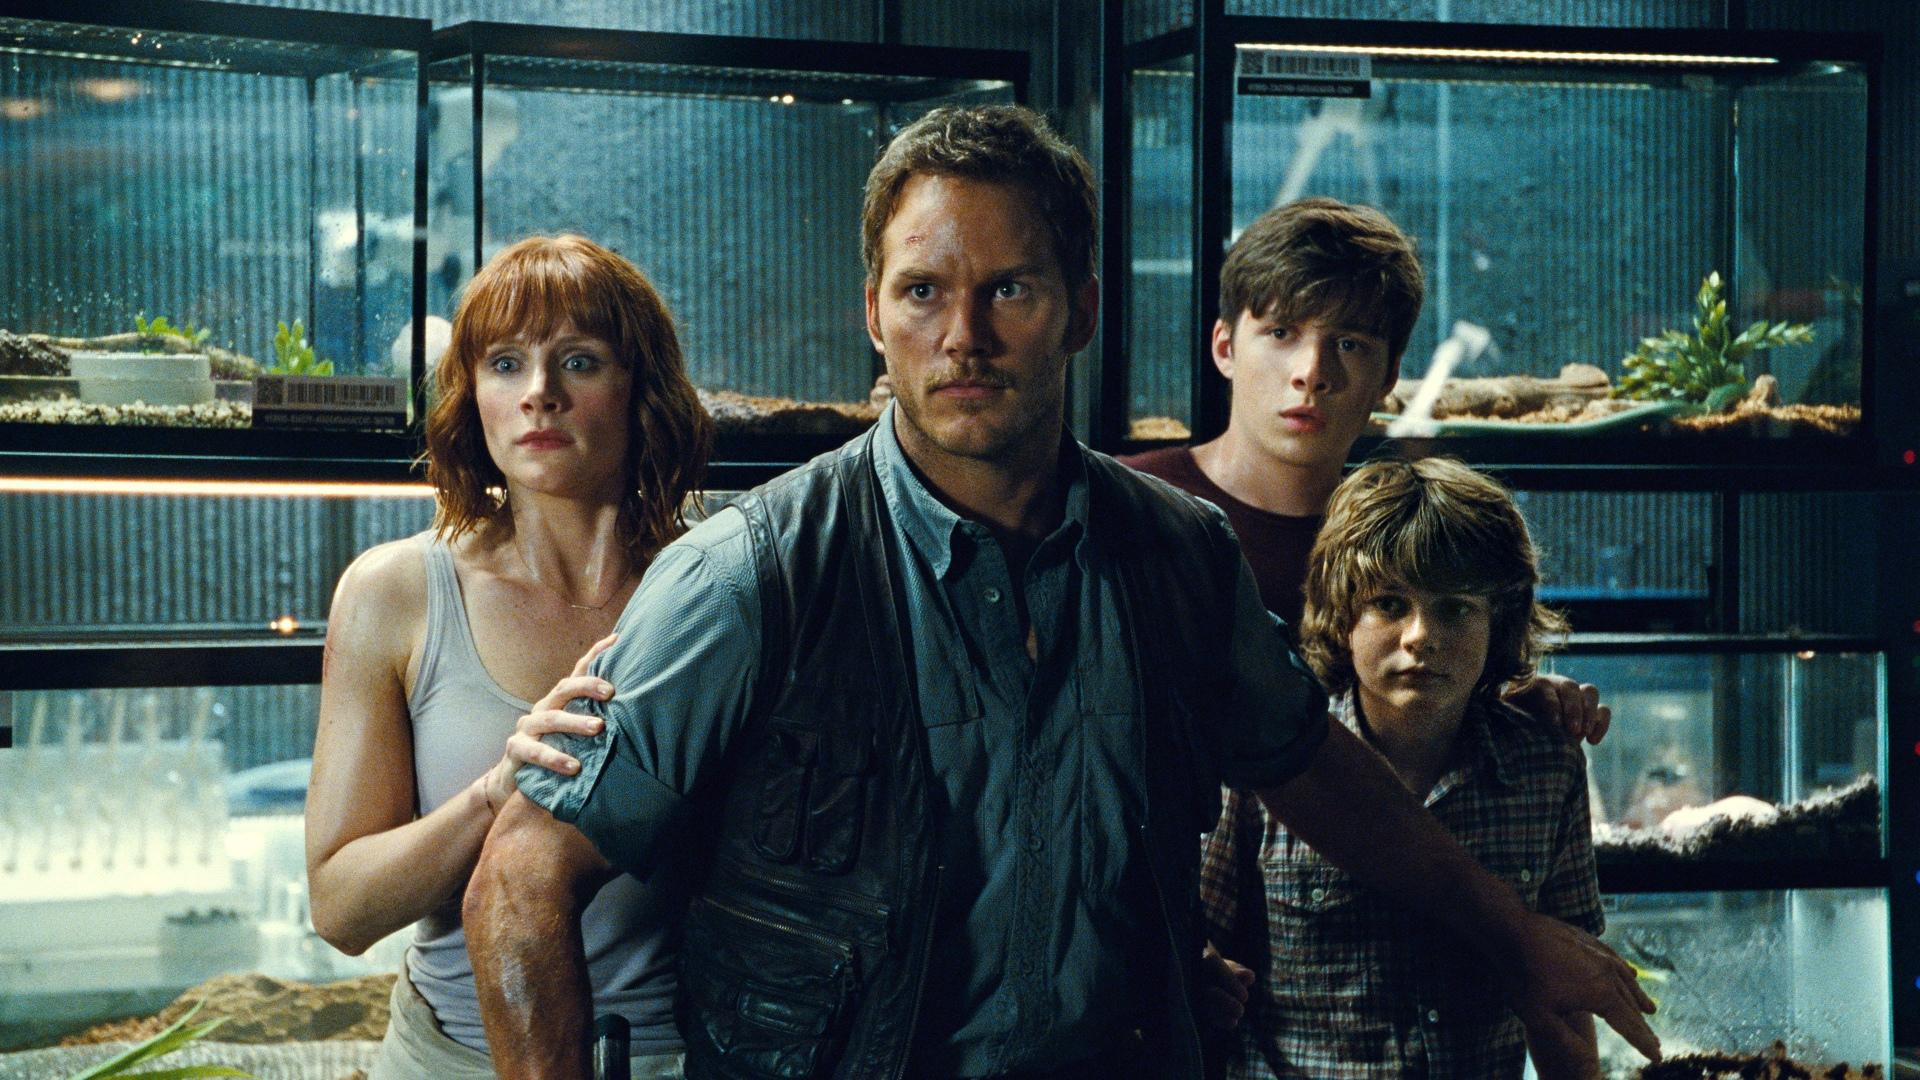 Jurassic_world_Cinema_2015_3.jpg